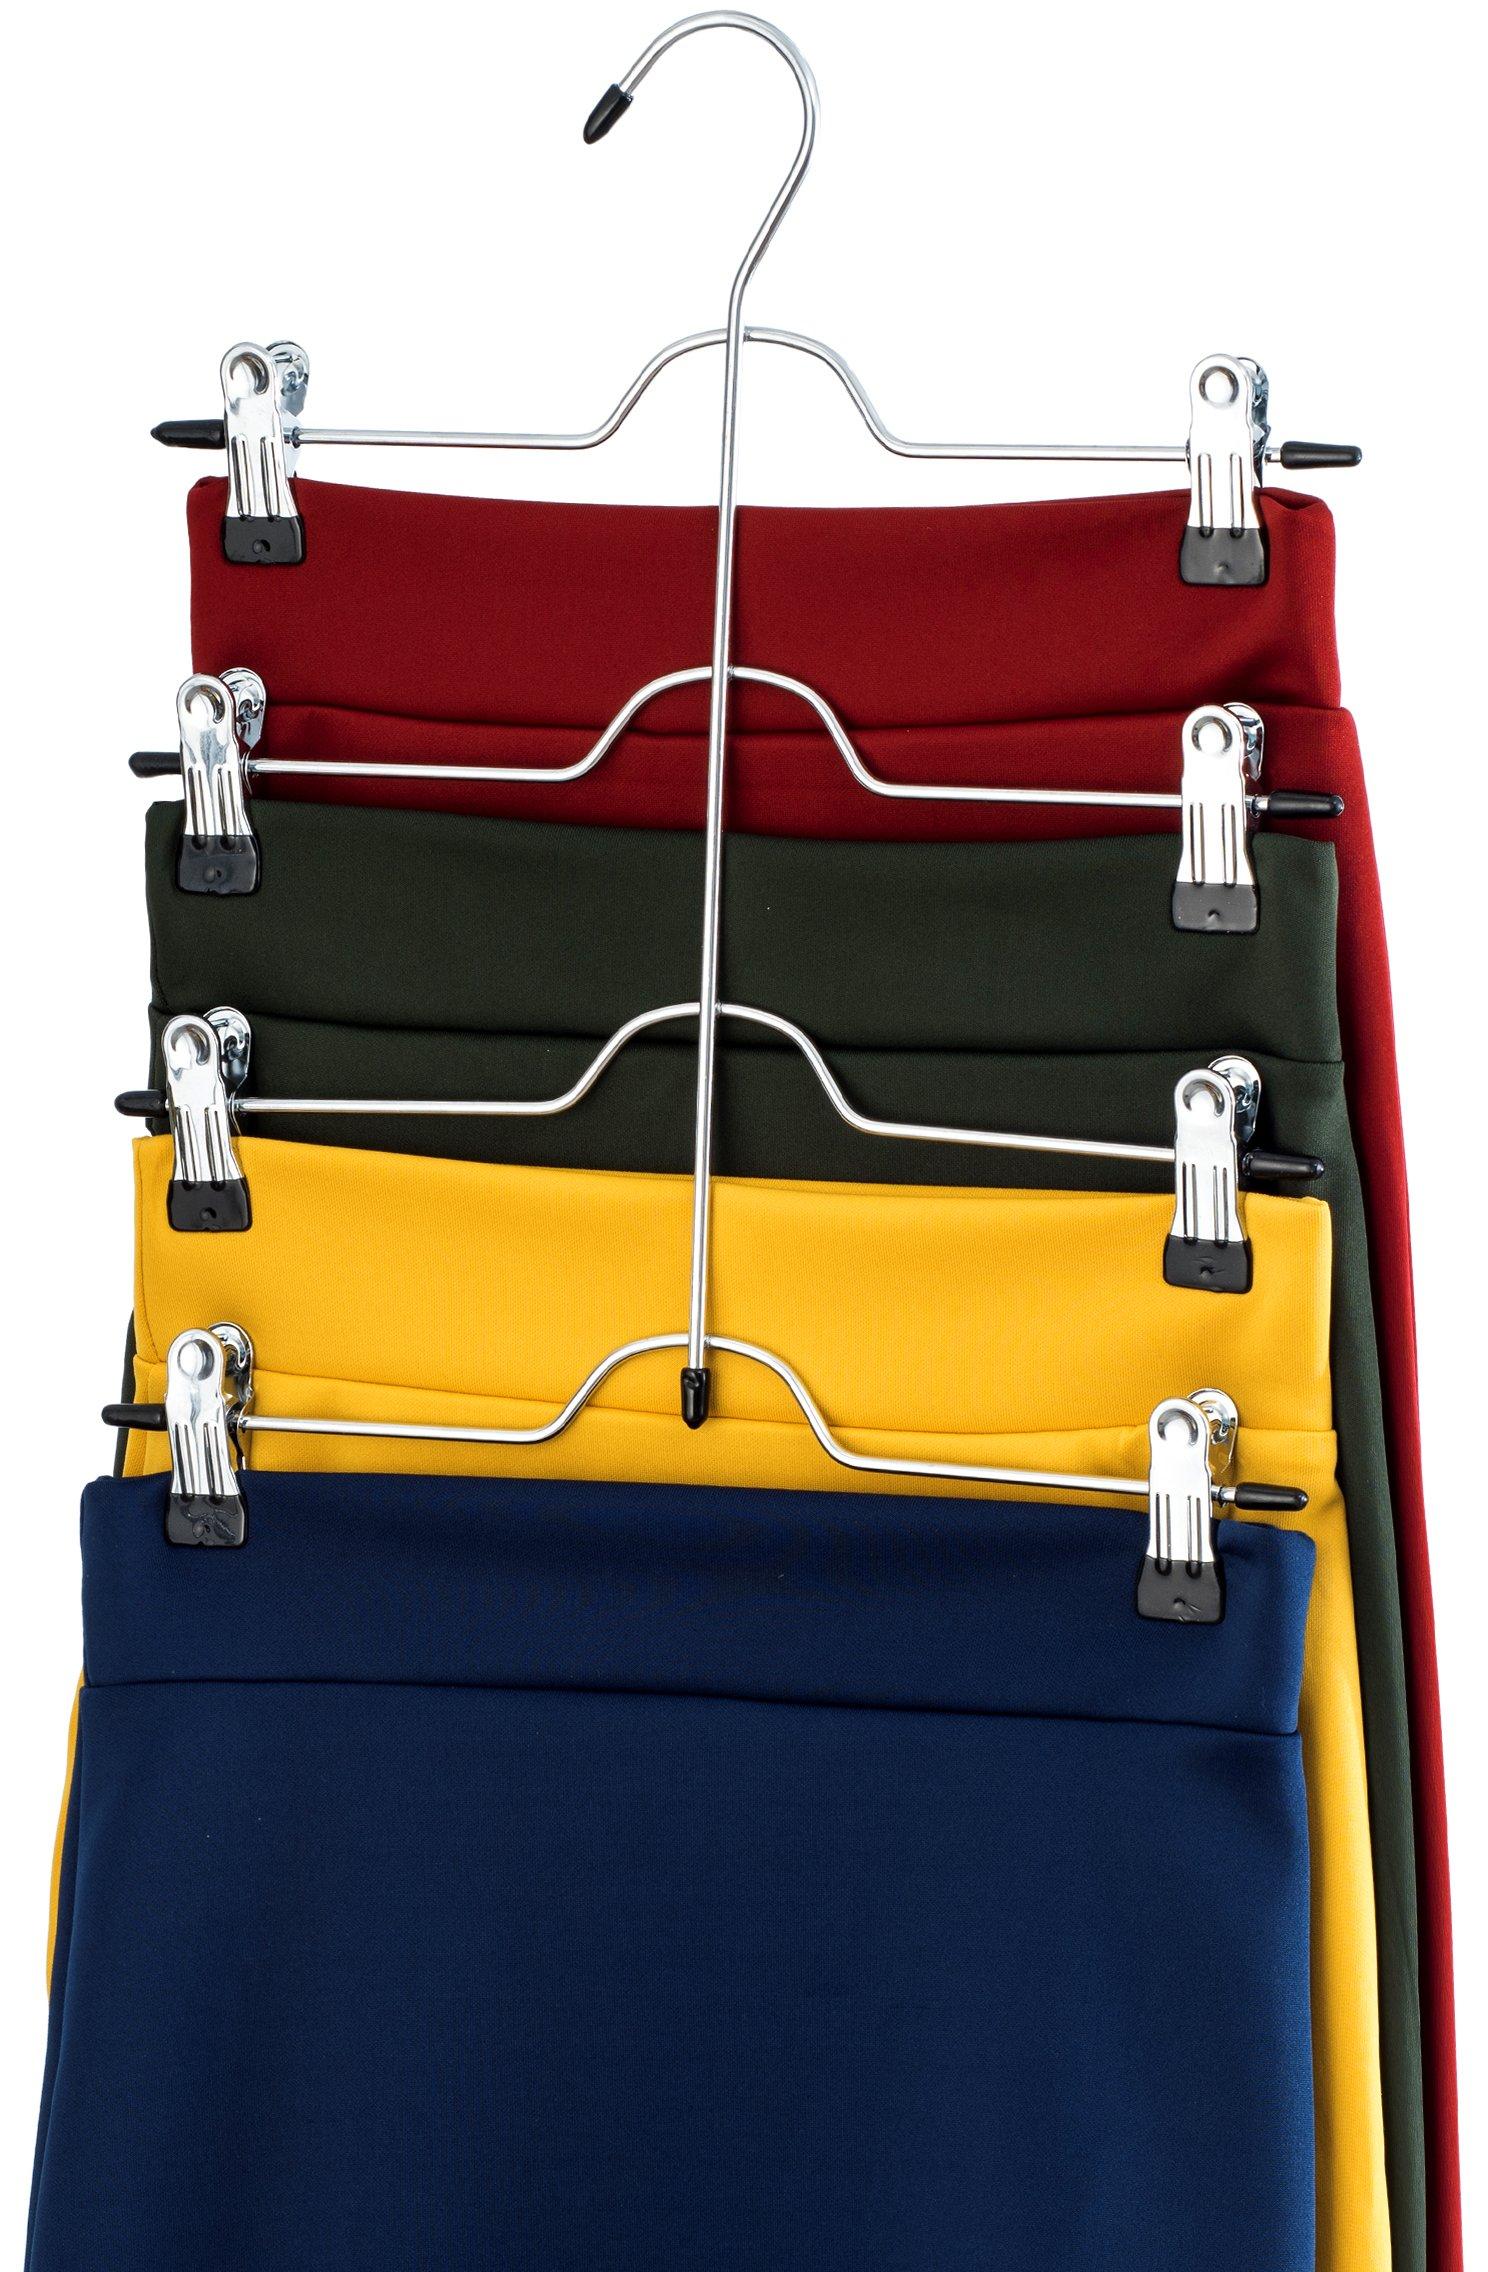 ZOBER Space Saving 4 Tier Trouser Skirt Hanger (Set of 3) Sturdy Luxurious Chrome with Non Slip Black Vinyl Clips, Multi Pants Hanger for Skirts, Pants, Slacks, Jeans, and More.